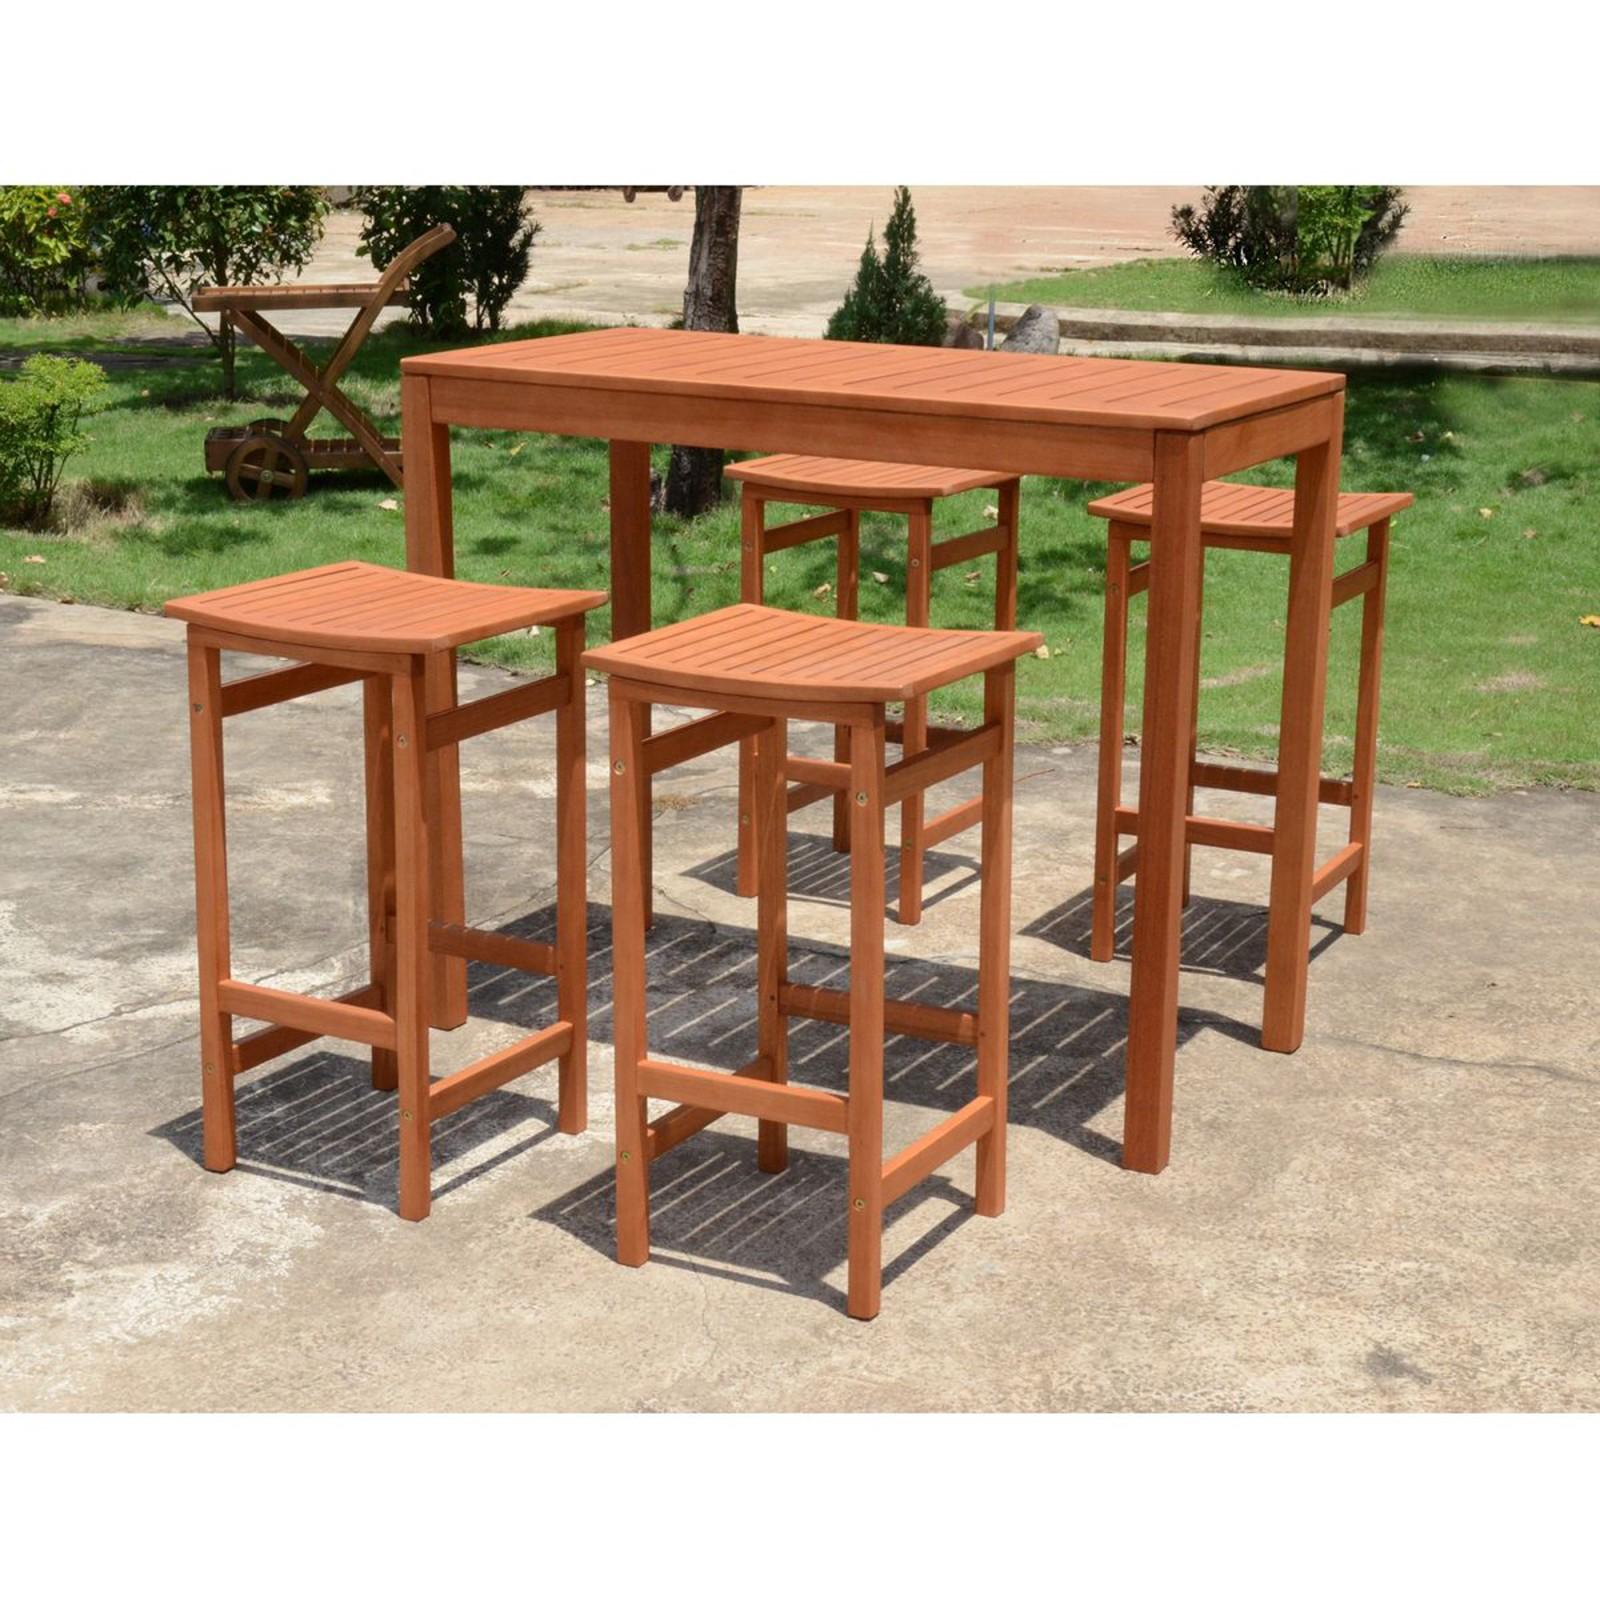 Bar Set Bartisch Barhocker Garnitur Sitzgruppe Holz Garten Hocker Stuhl  Tisch